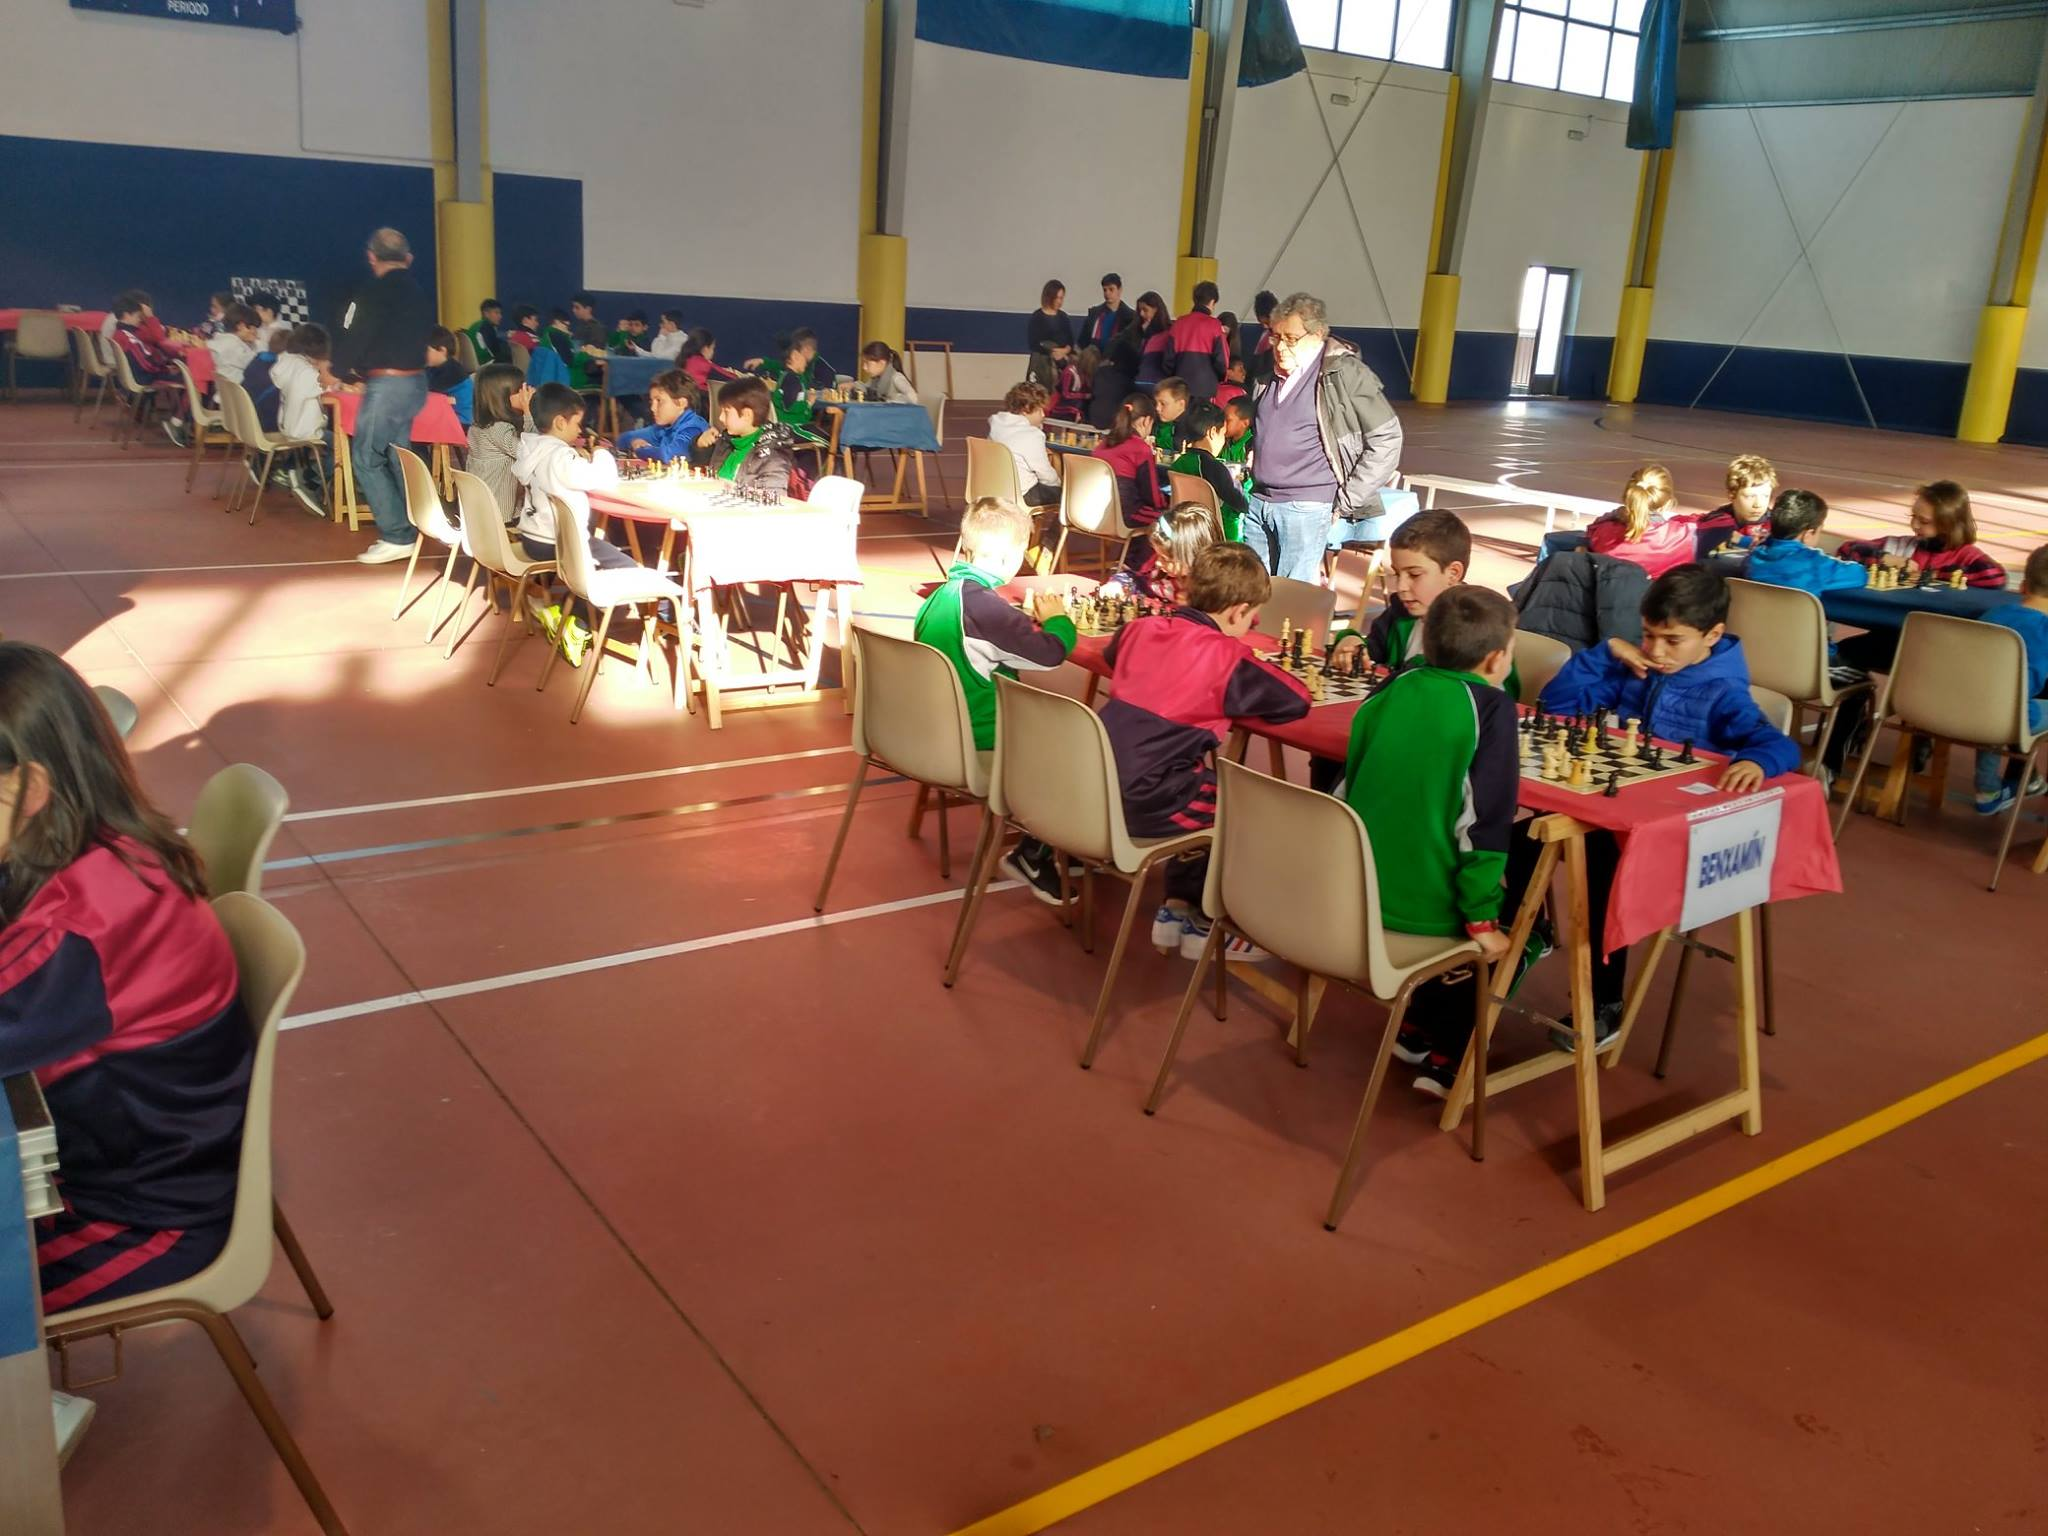 Seguemento De Eventos Deportivos Colexio Do Pilar # Muebles Huertas Lourenza